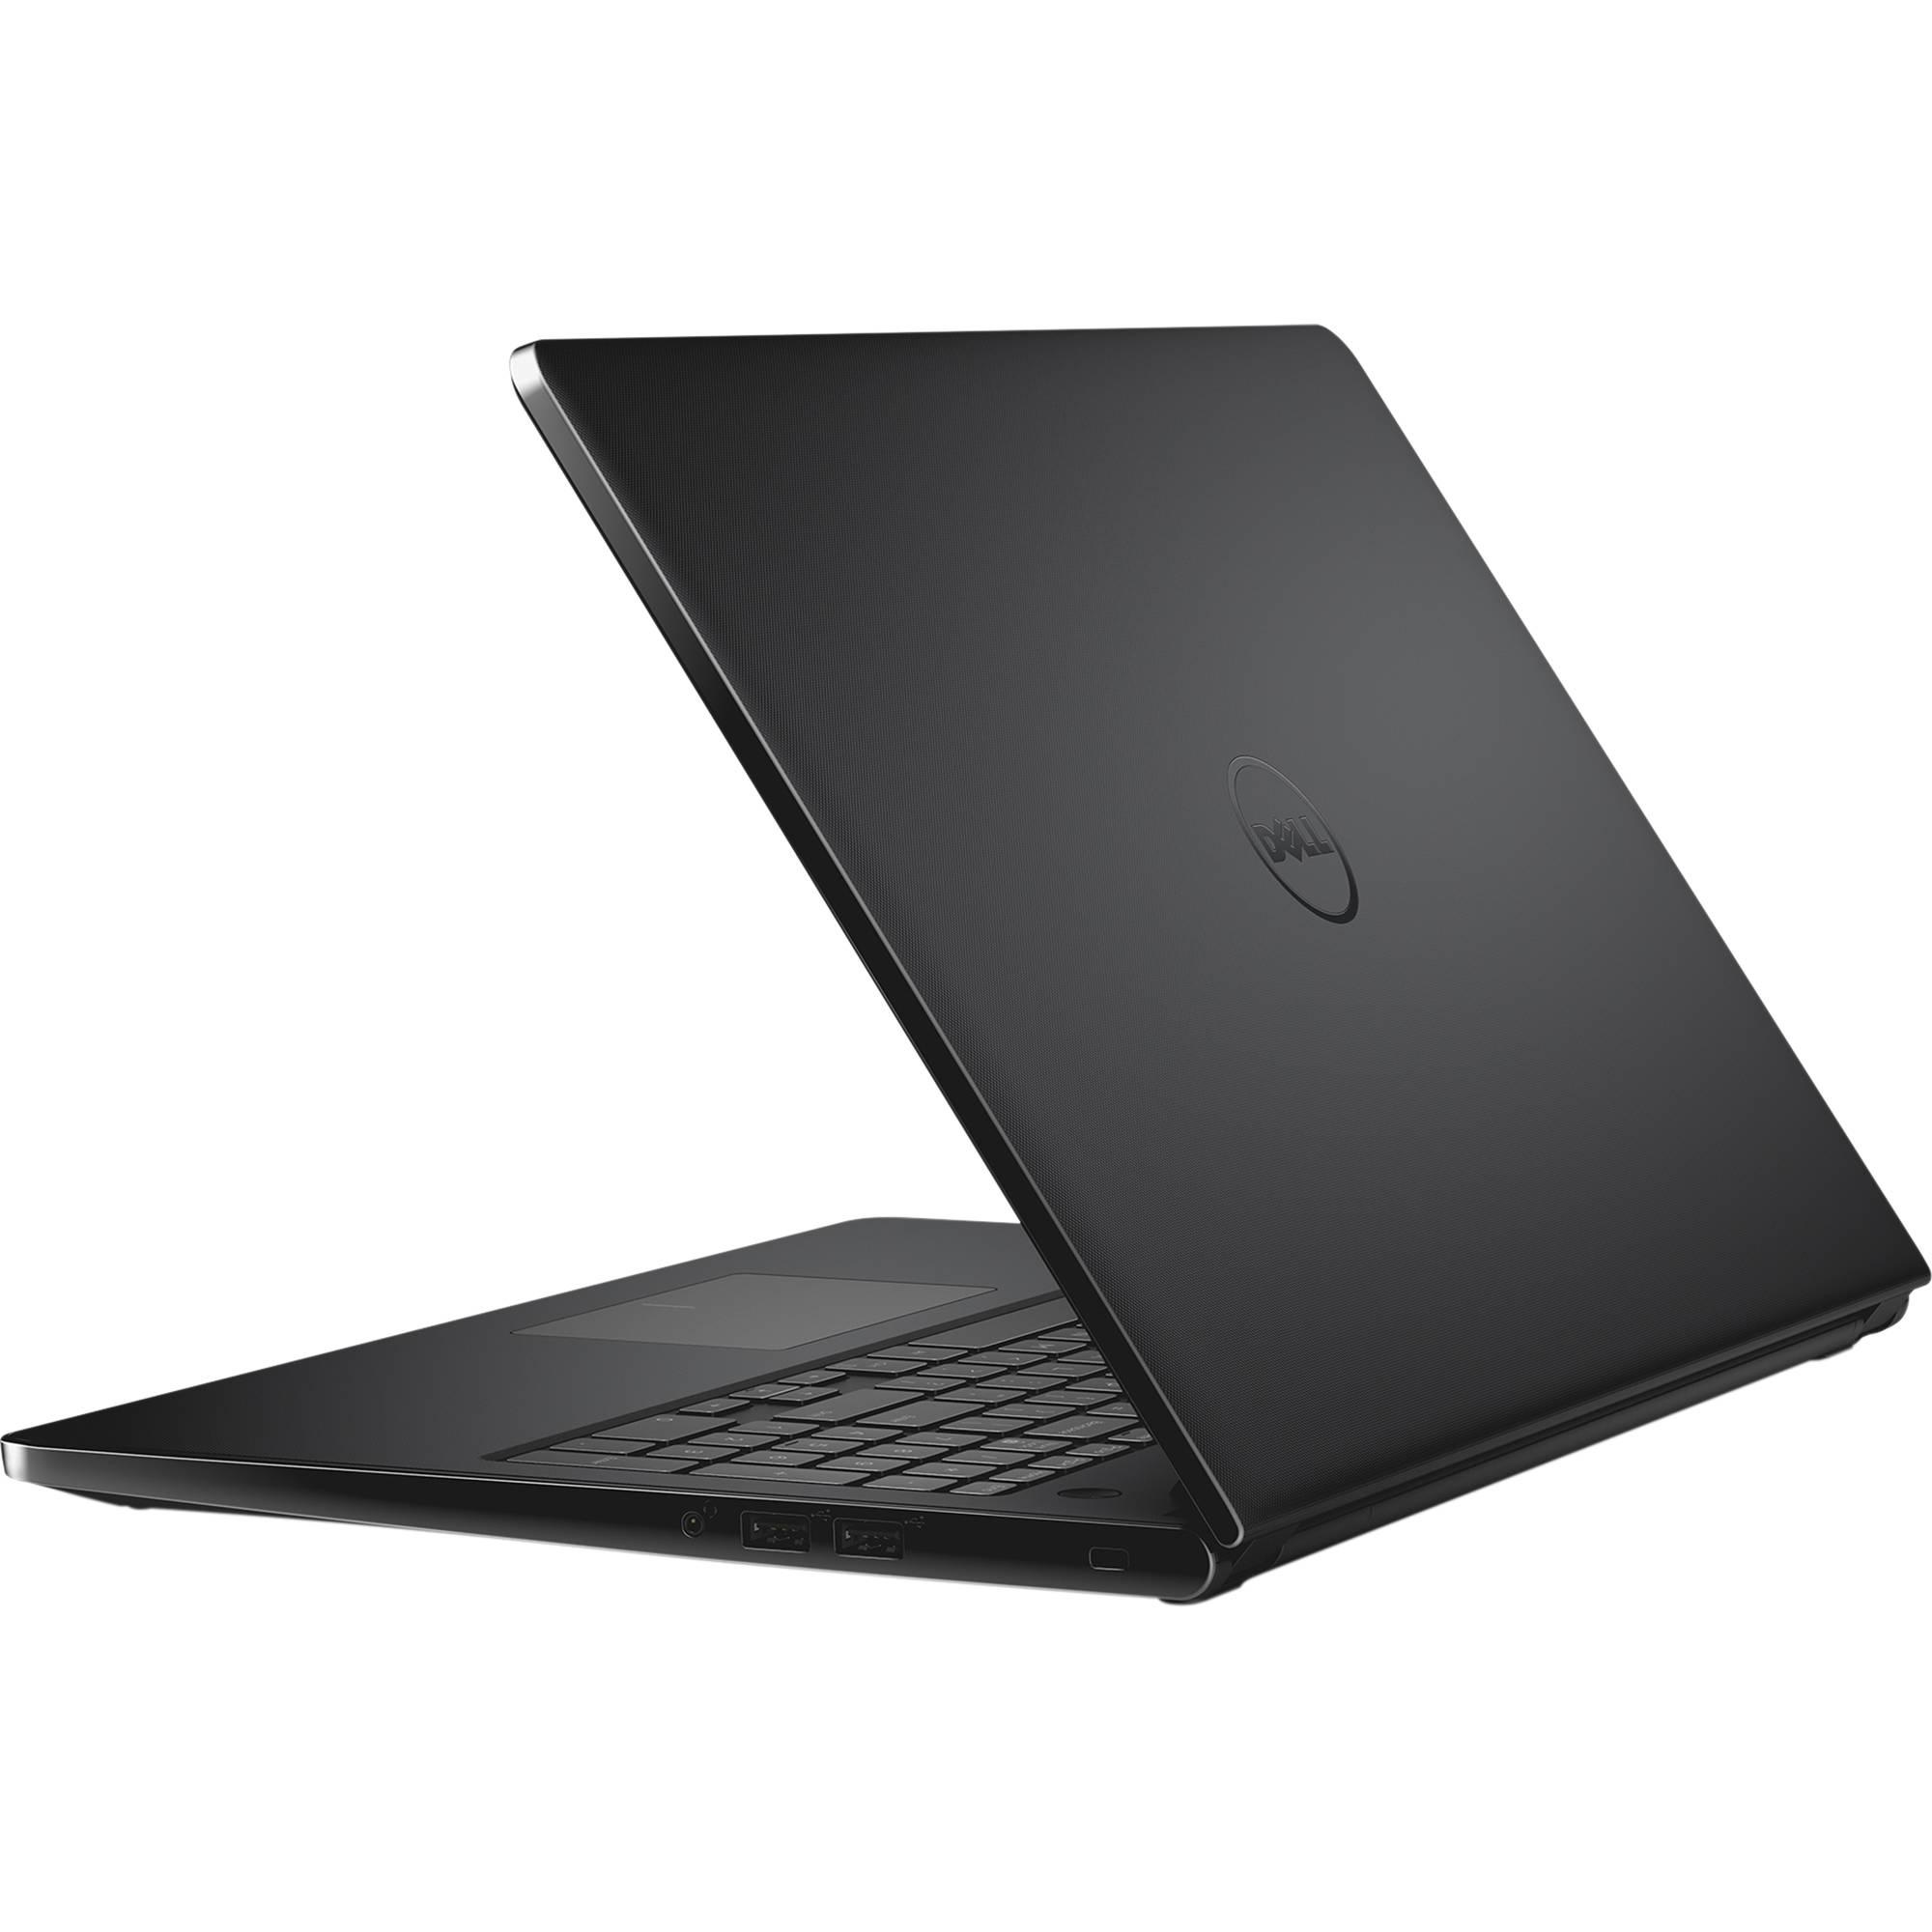 dell inspiron 15 6 laptop 4gb 500gb windows 10 i5552 4392blk ebay. Black Bedroom Furniture Sets. Home Design Ideas